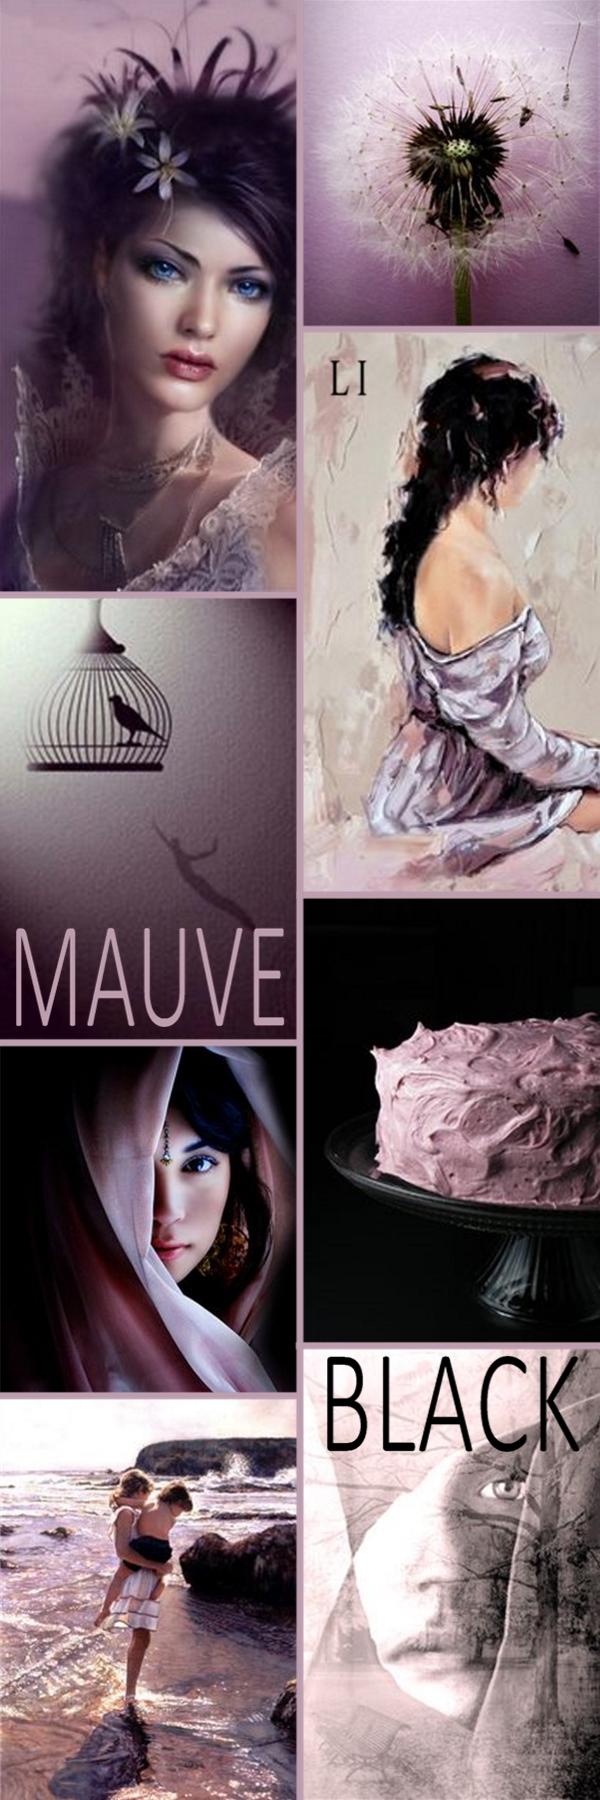 Lu's Inspiration ღ Mauve and Black